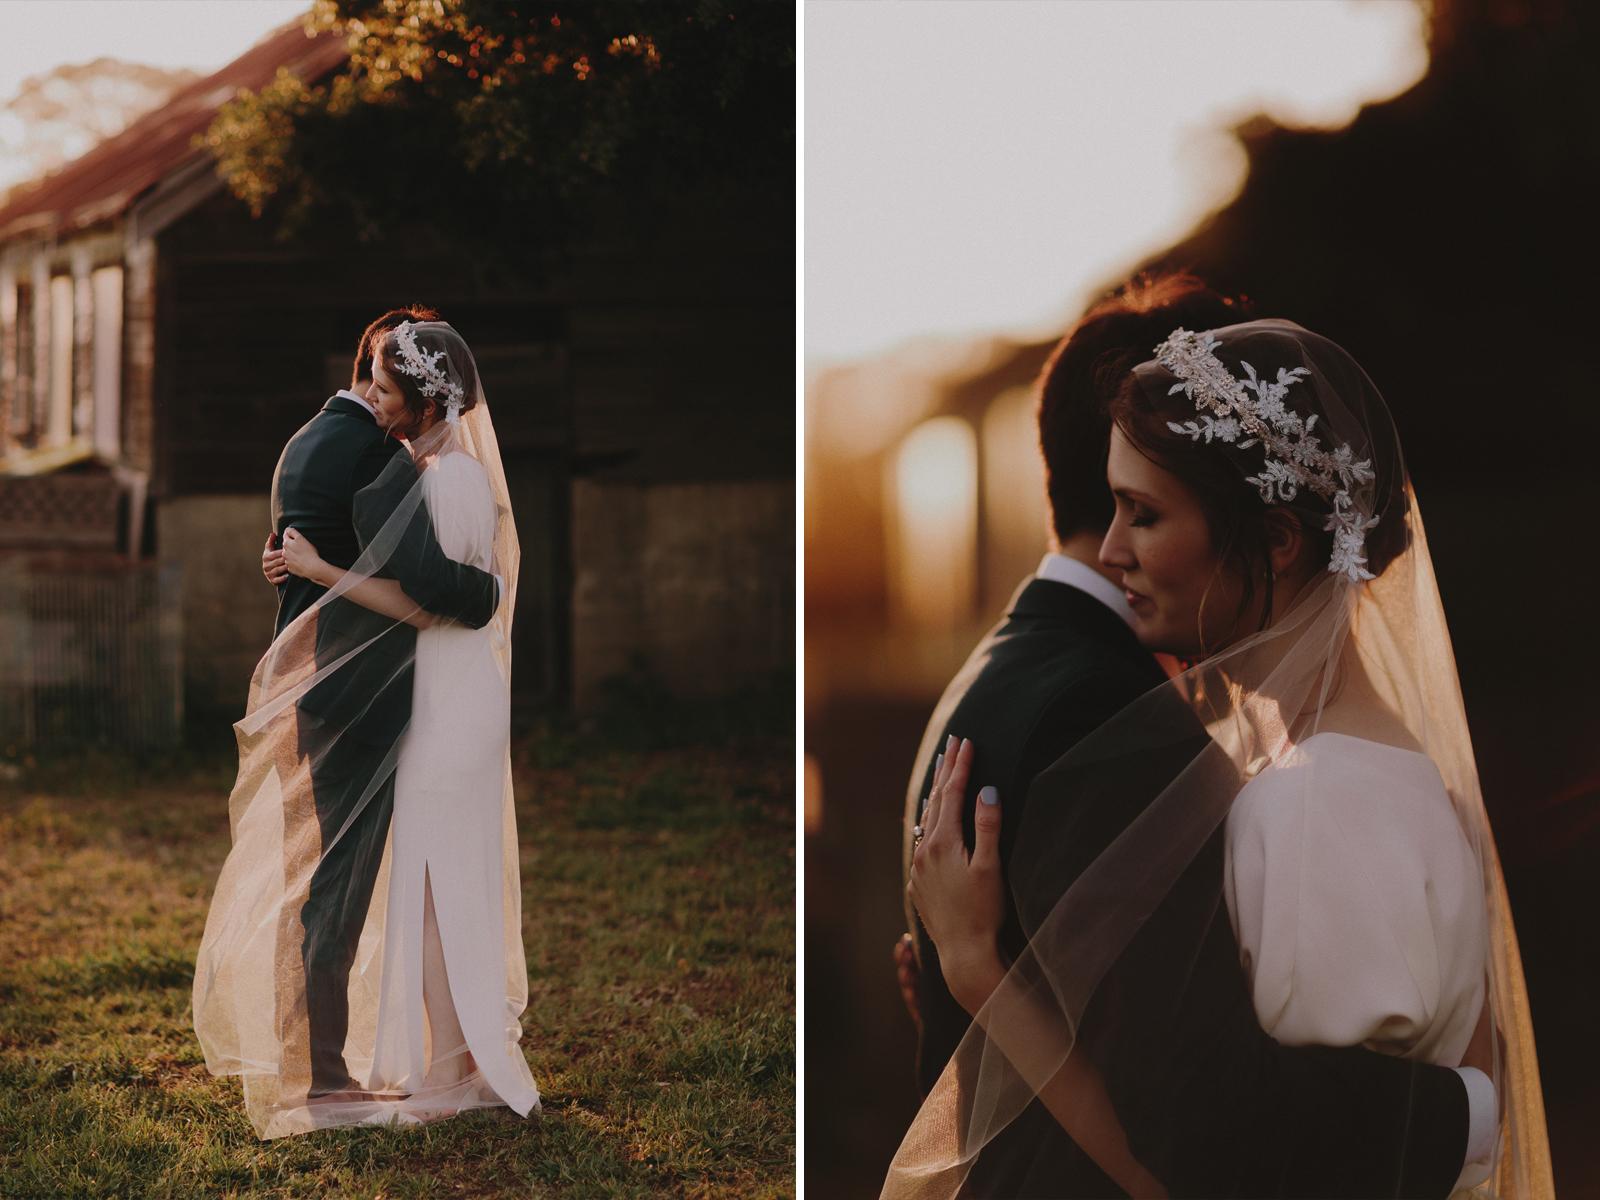 trish-lee-blouson-wedding-dress-5.jpg